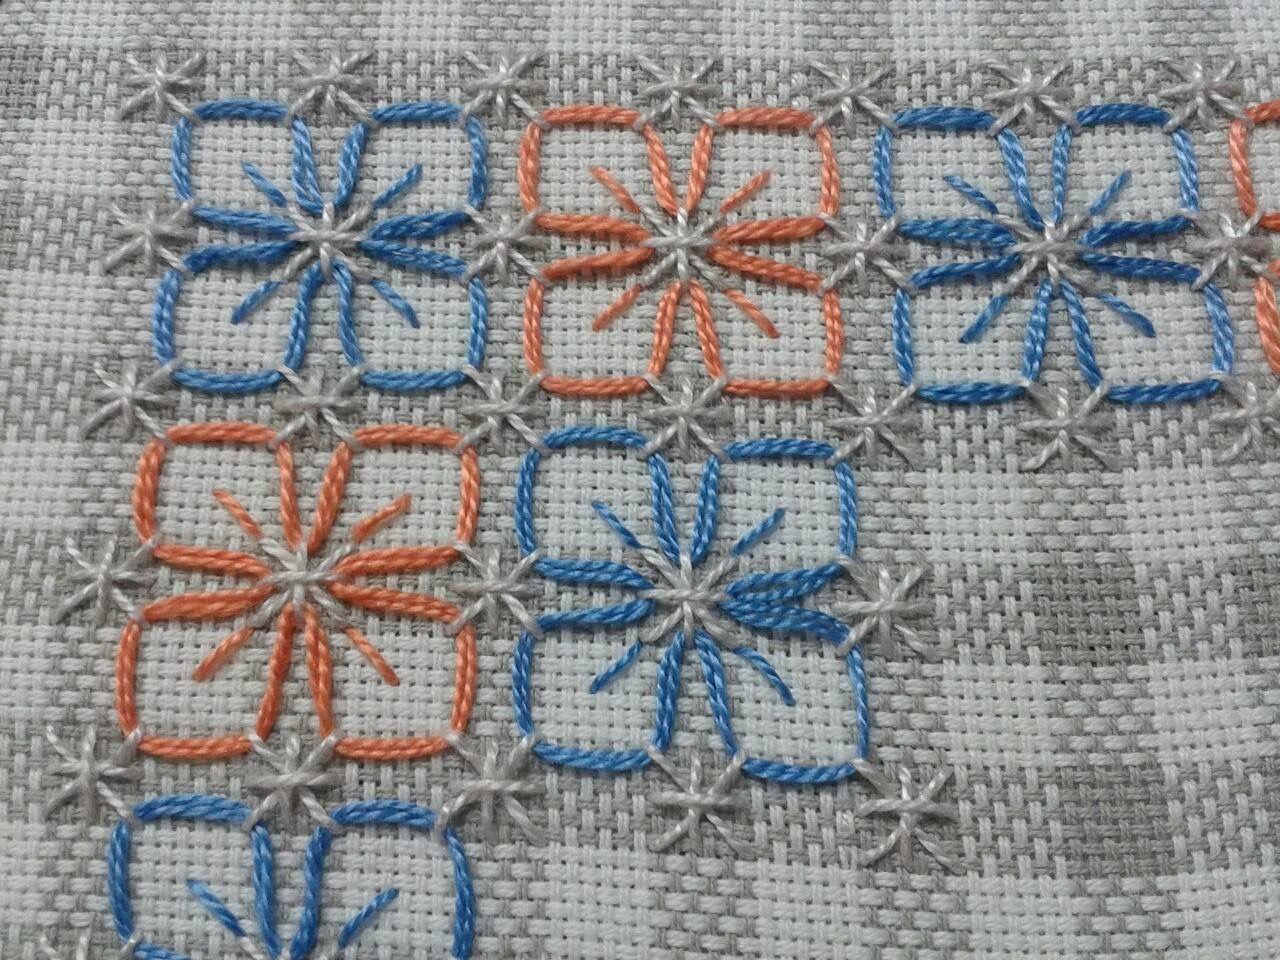 Pin de joeli pereira en Croche | Pinterest | Bordado, Español y Puntadas